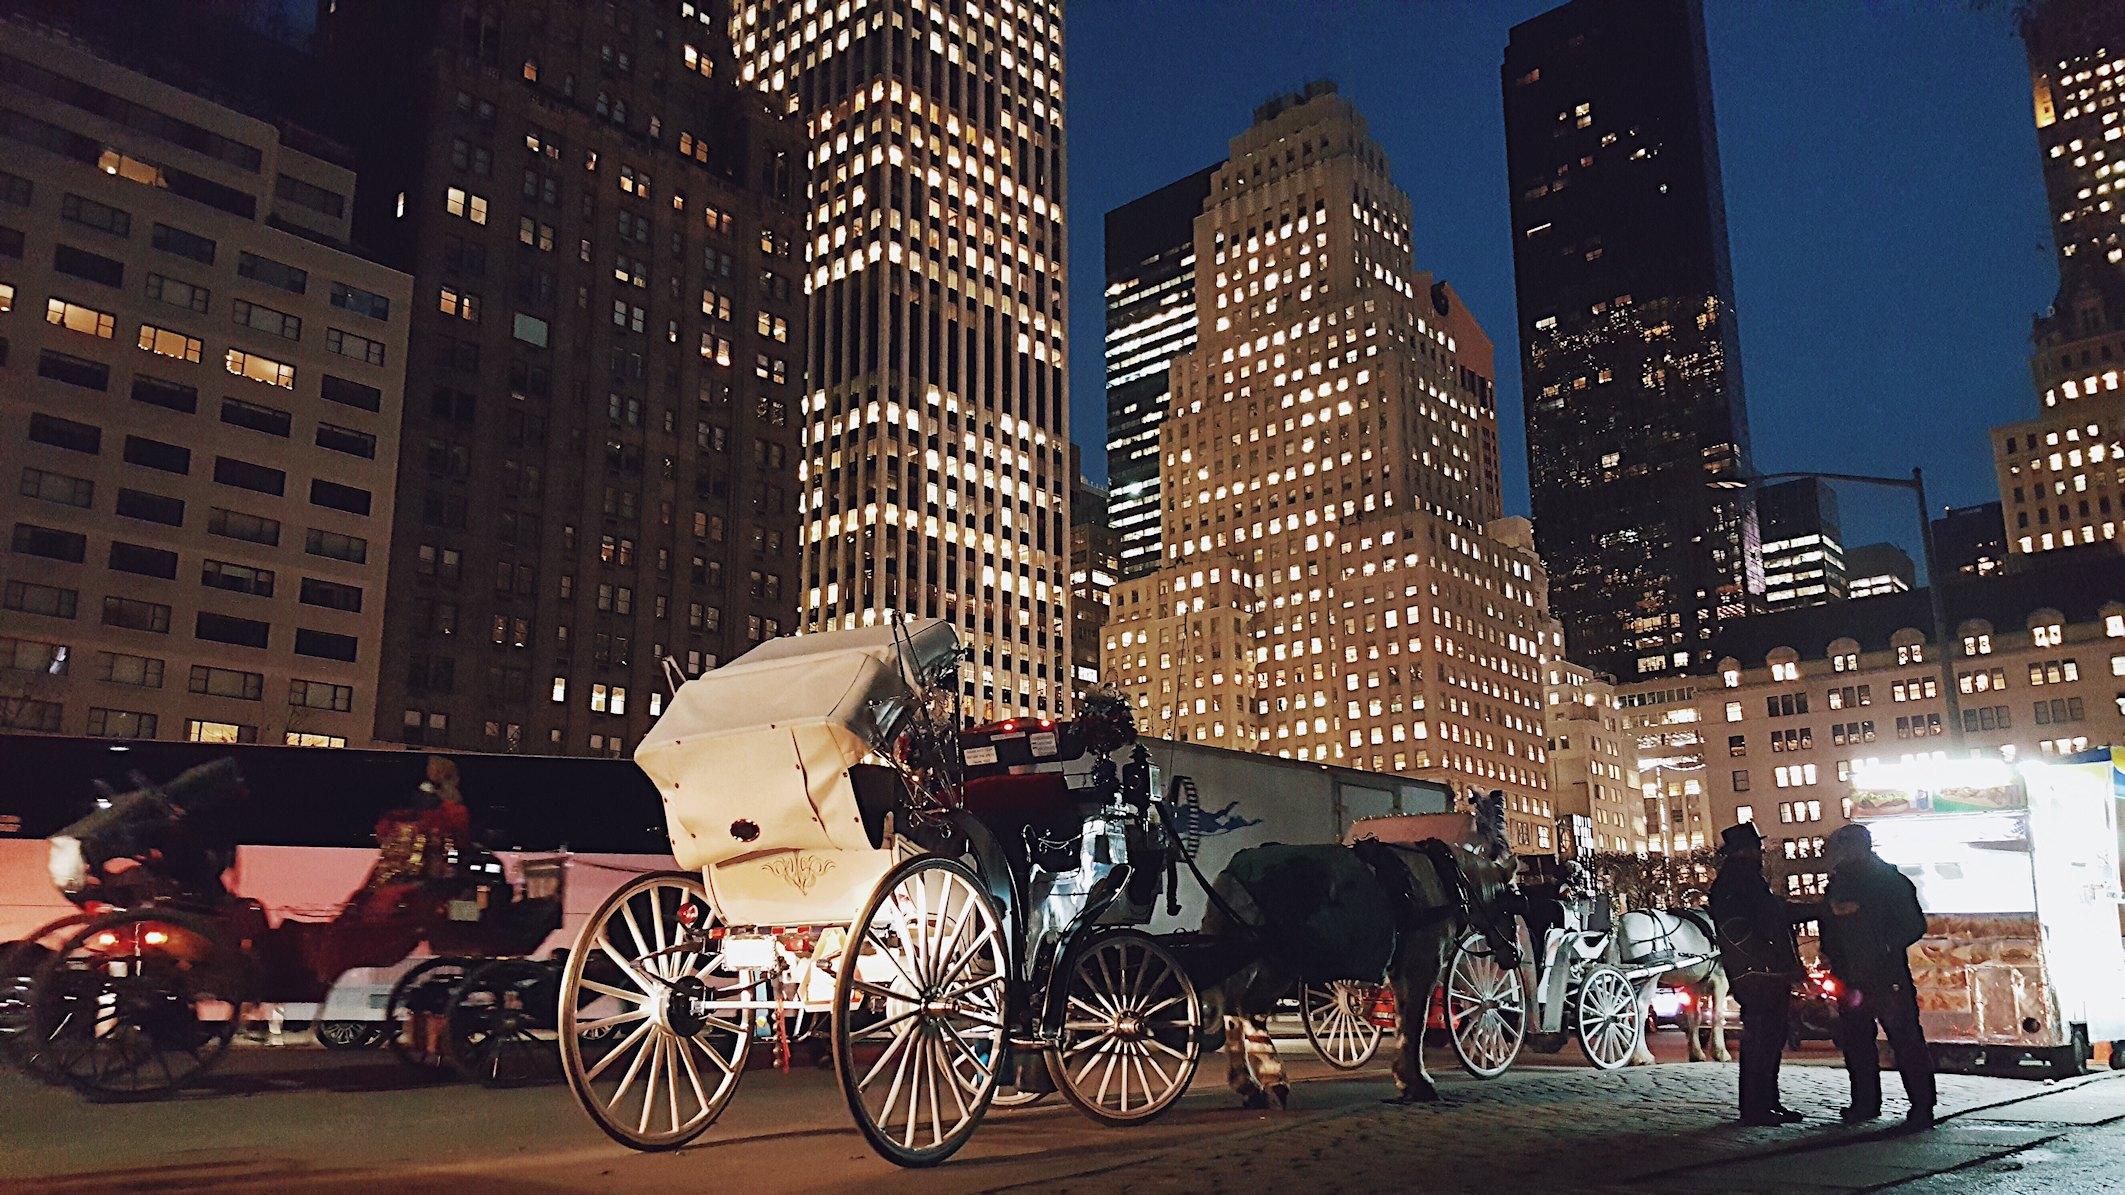 USA, Nowy Jork, Piąta Aleja, Fifth Avenue